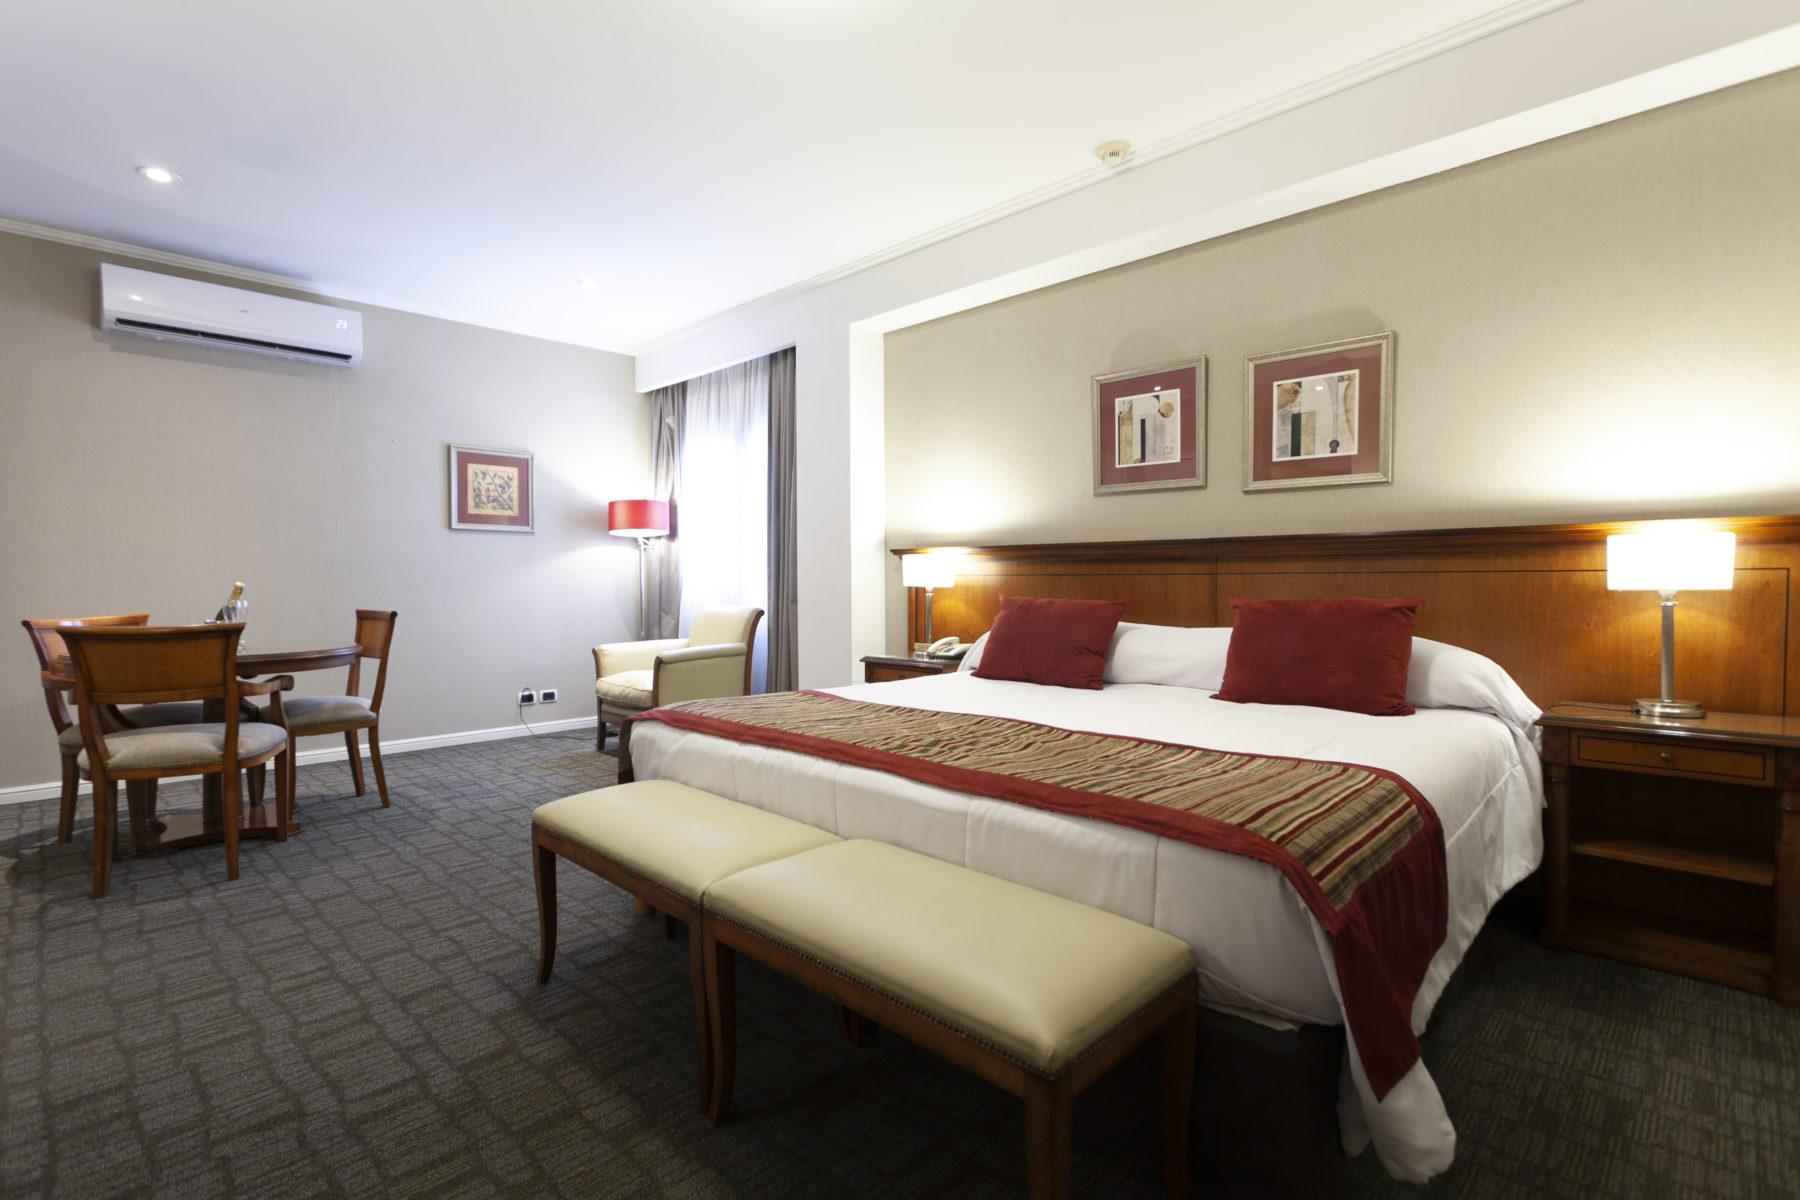 Fotografias del hotel Tucuman Center para Agencia Supra.